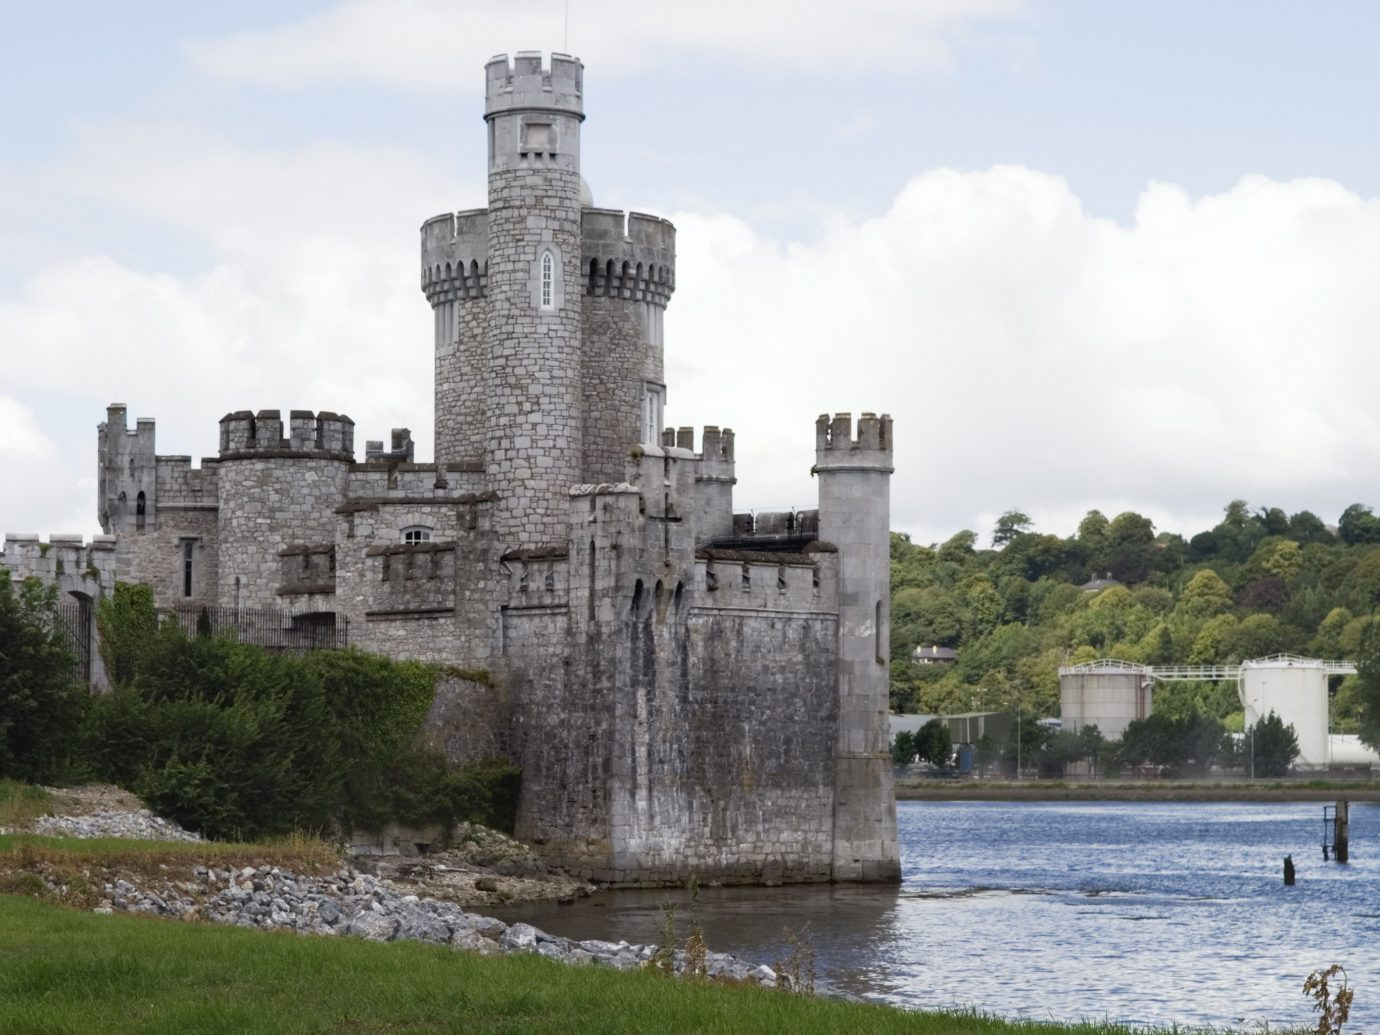 Dublin Ireland Trip Ideas sky outdoor building water castle moat River fortification water castle reservoir Lake tree château cloud turret stone